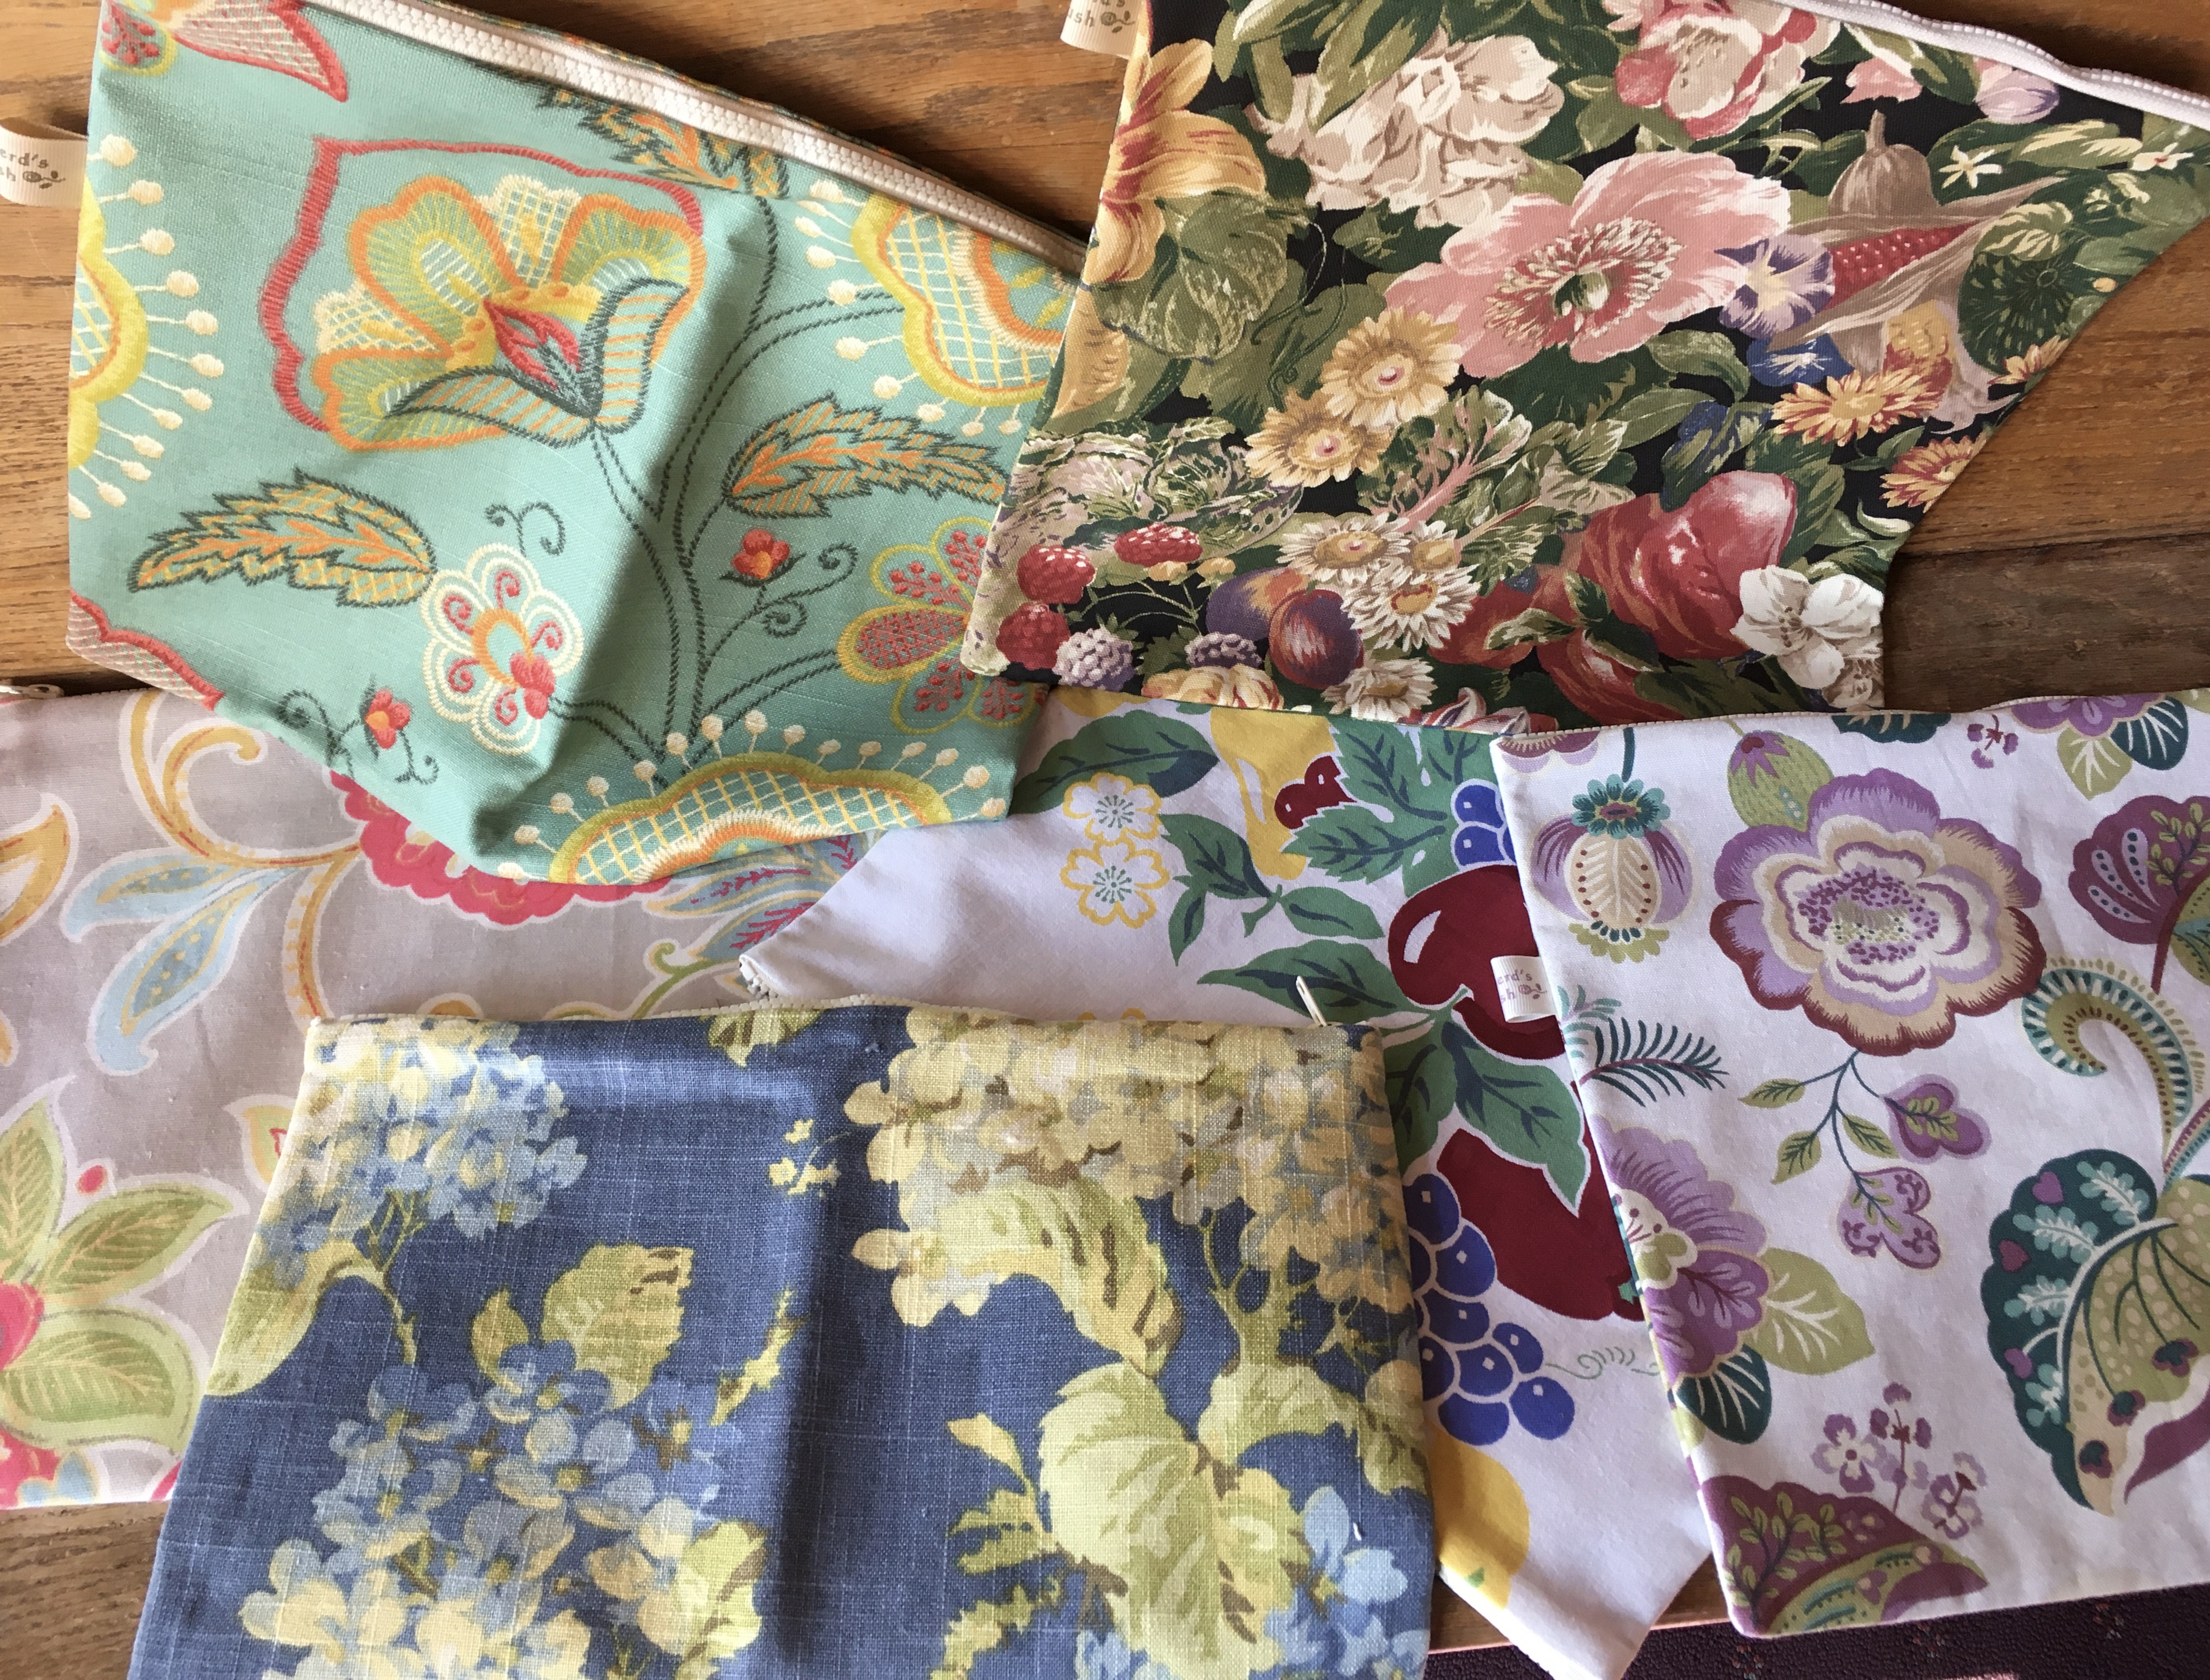 Shepherd's Bush Stitching Bags